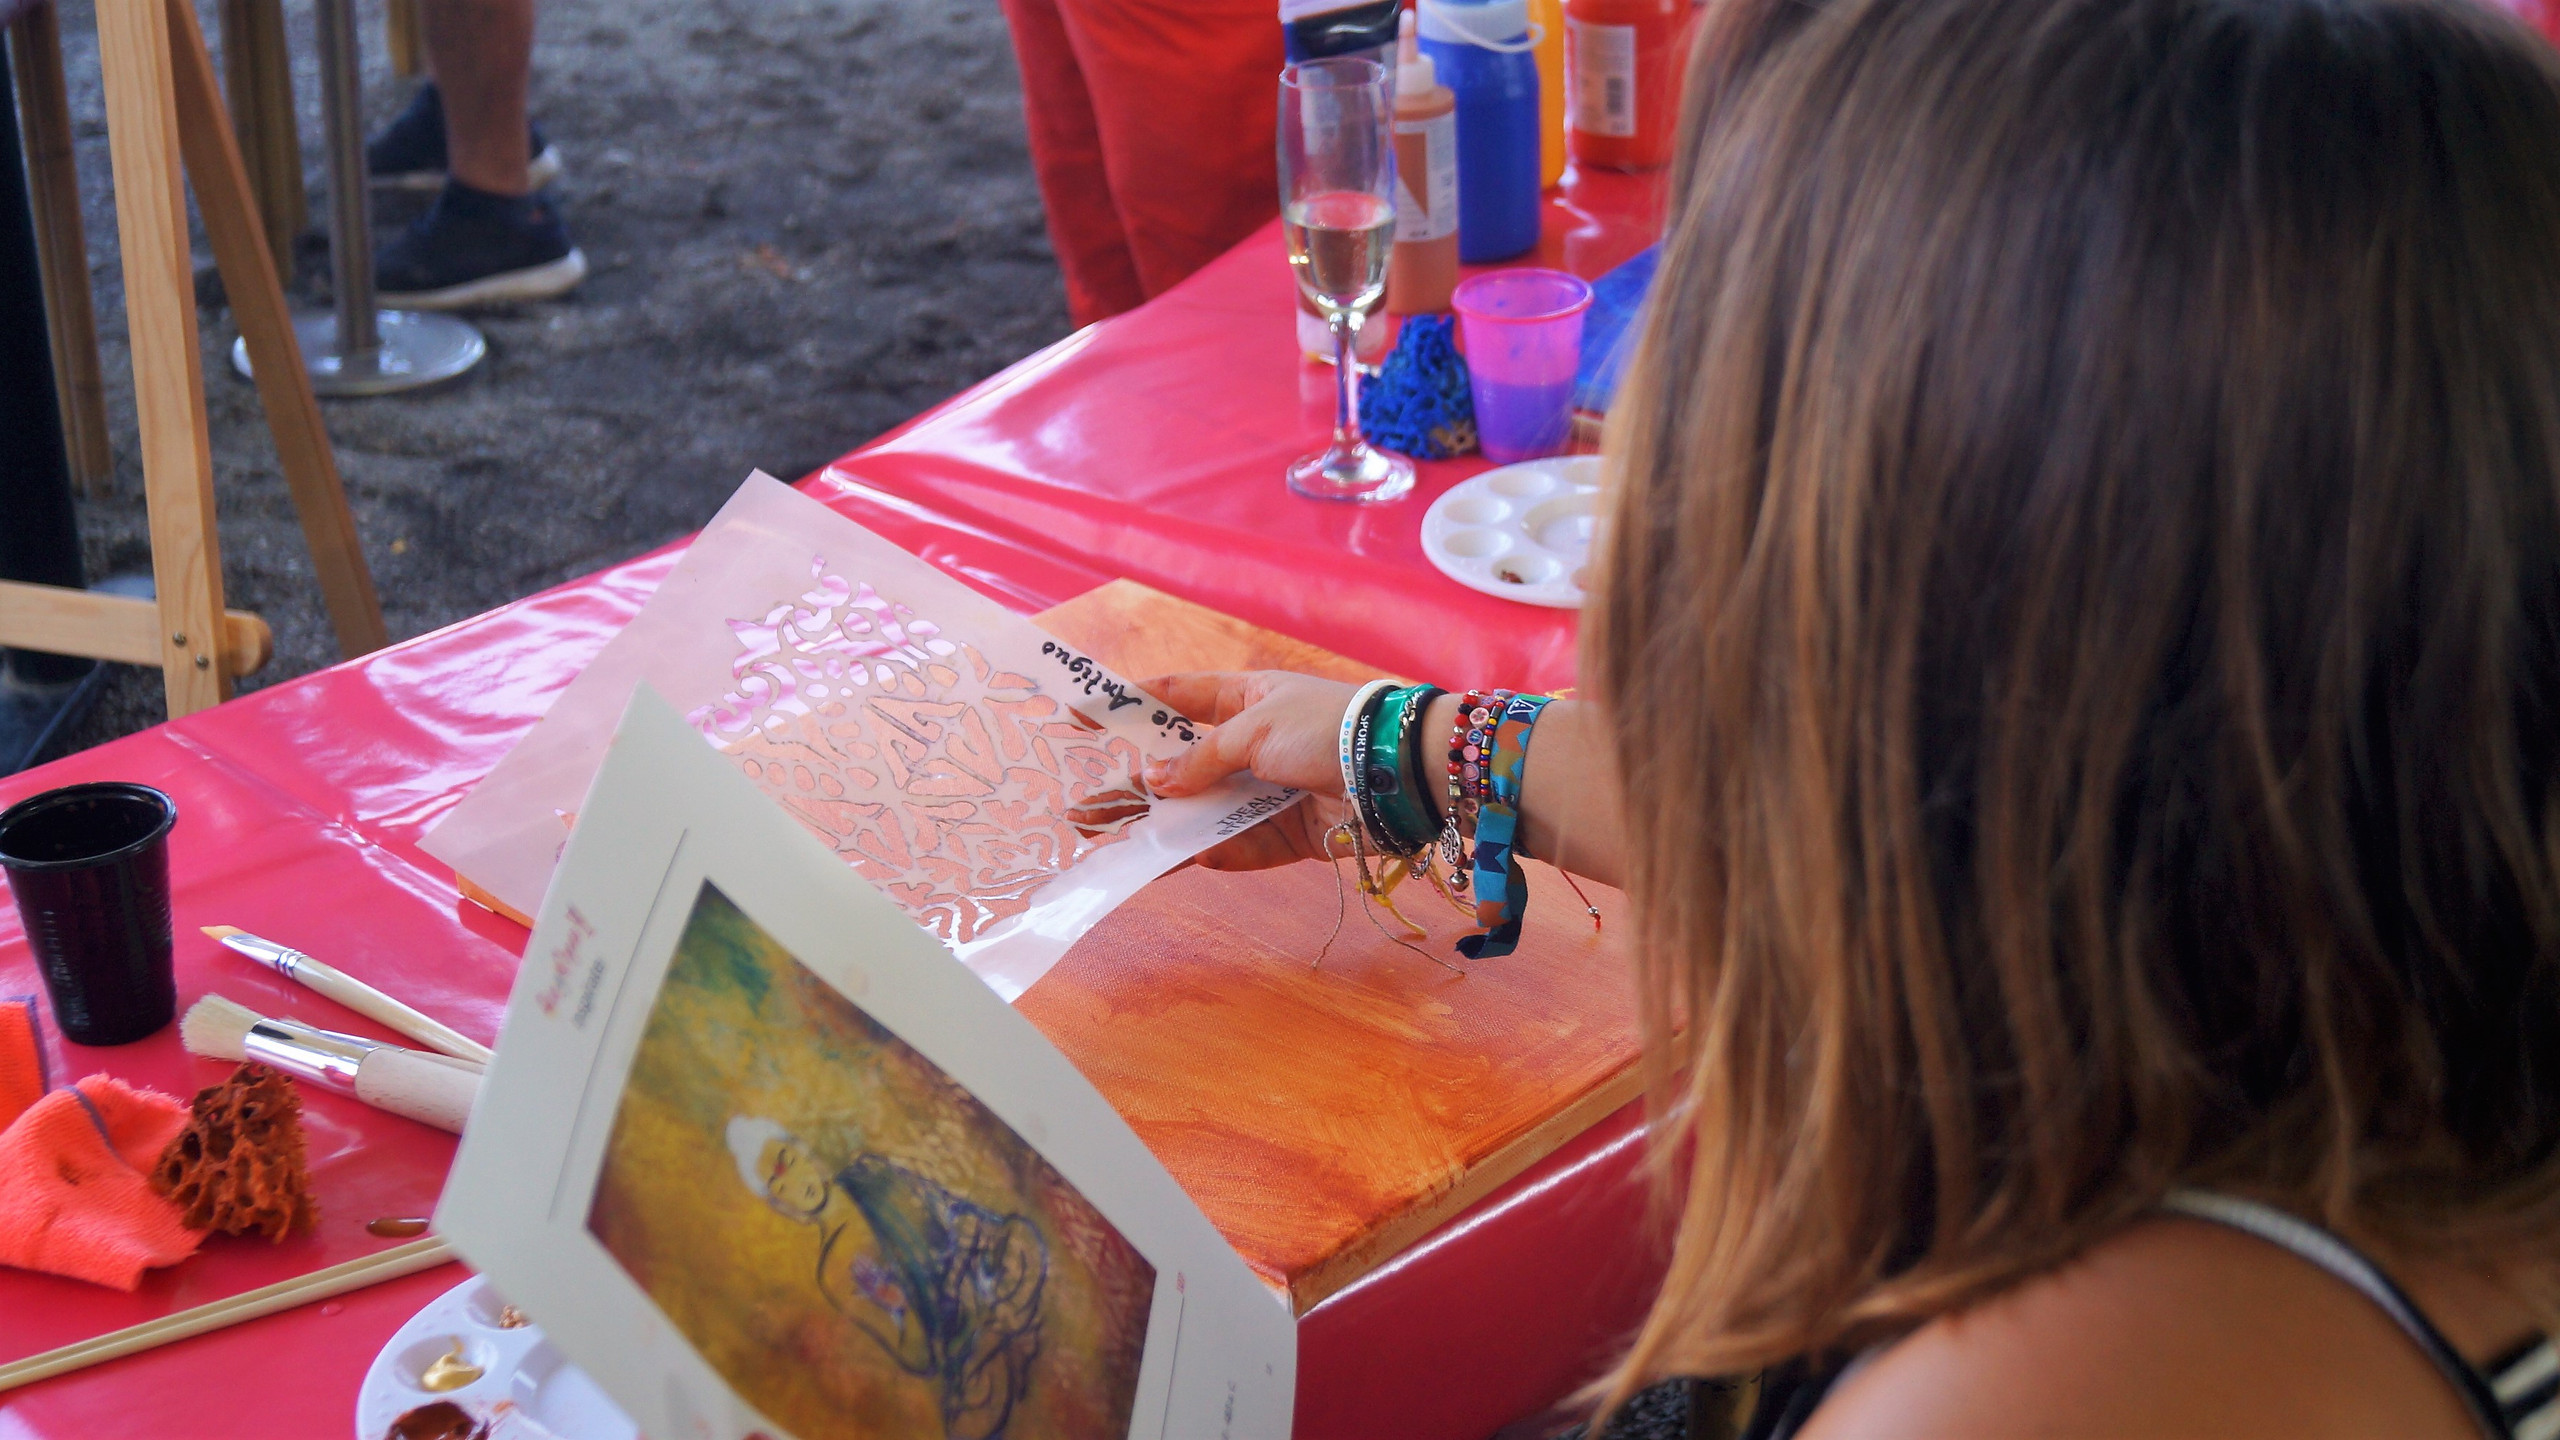 004-ARTEyCOPAS-Evento-La-Gustosa-23-08-2017-9539